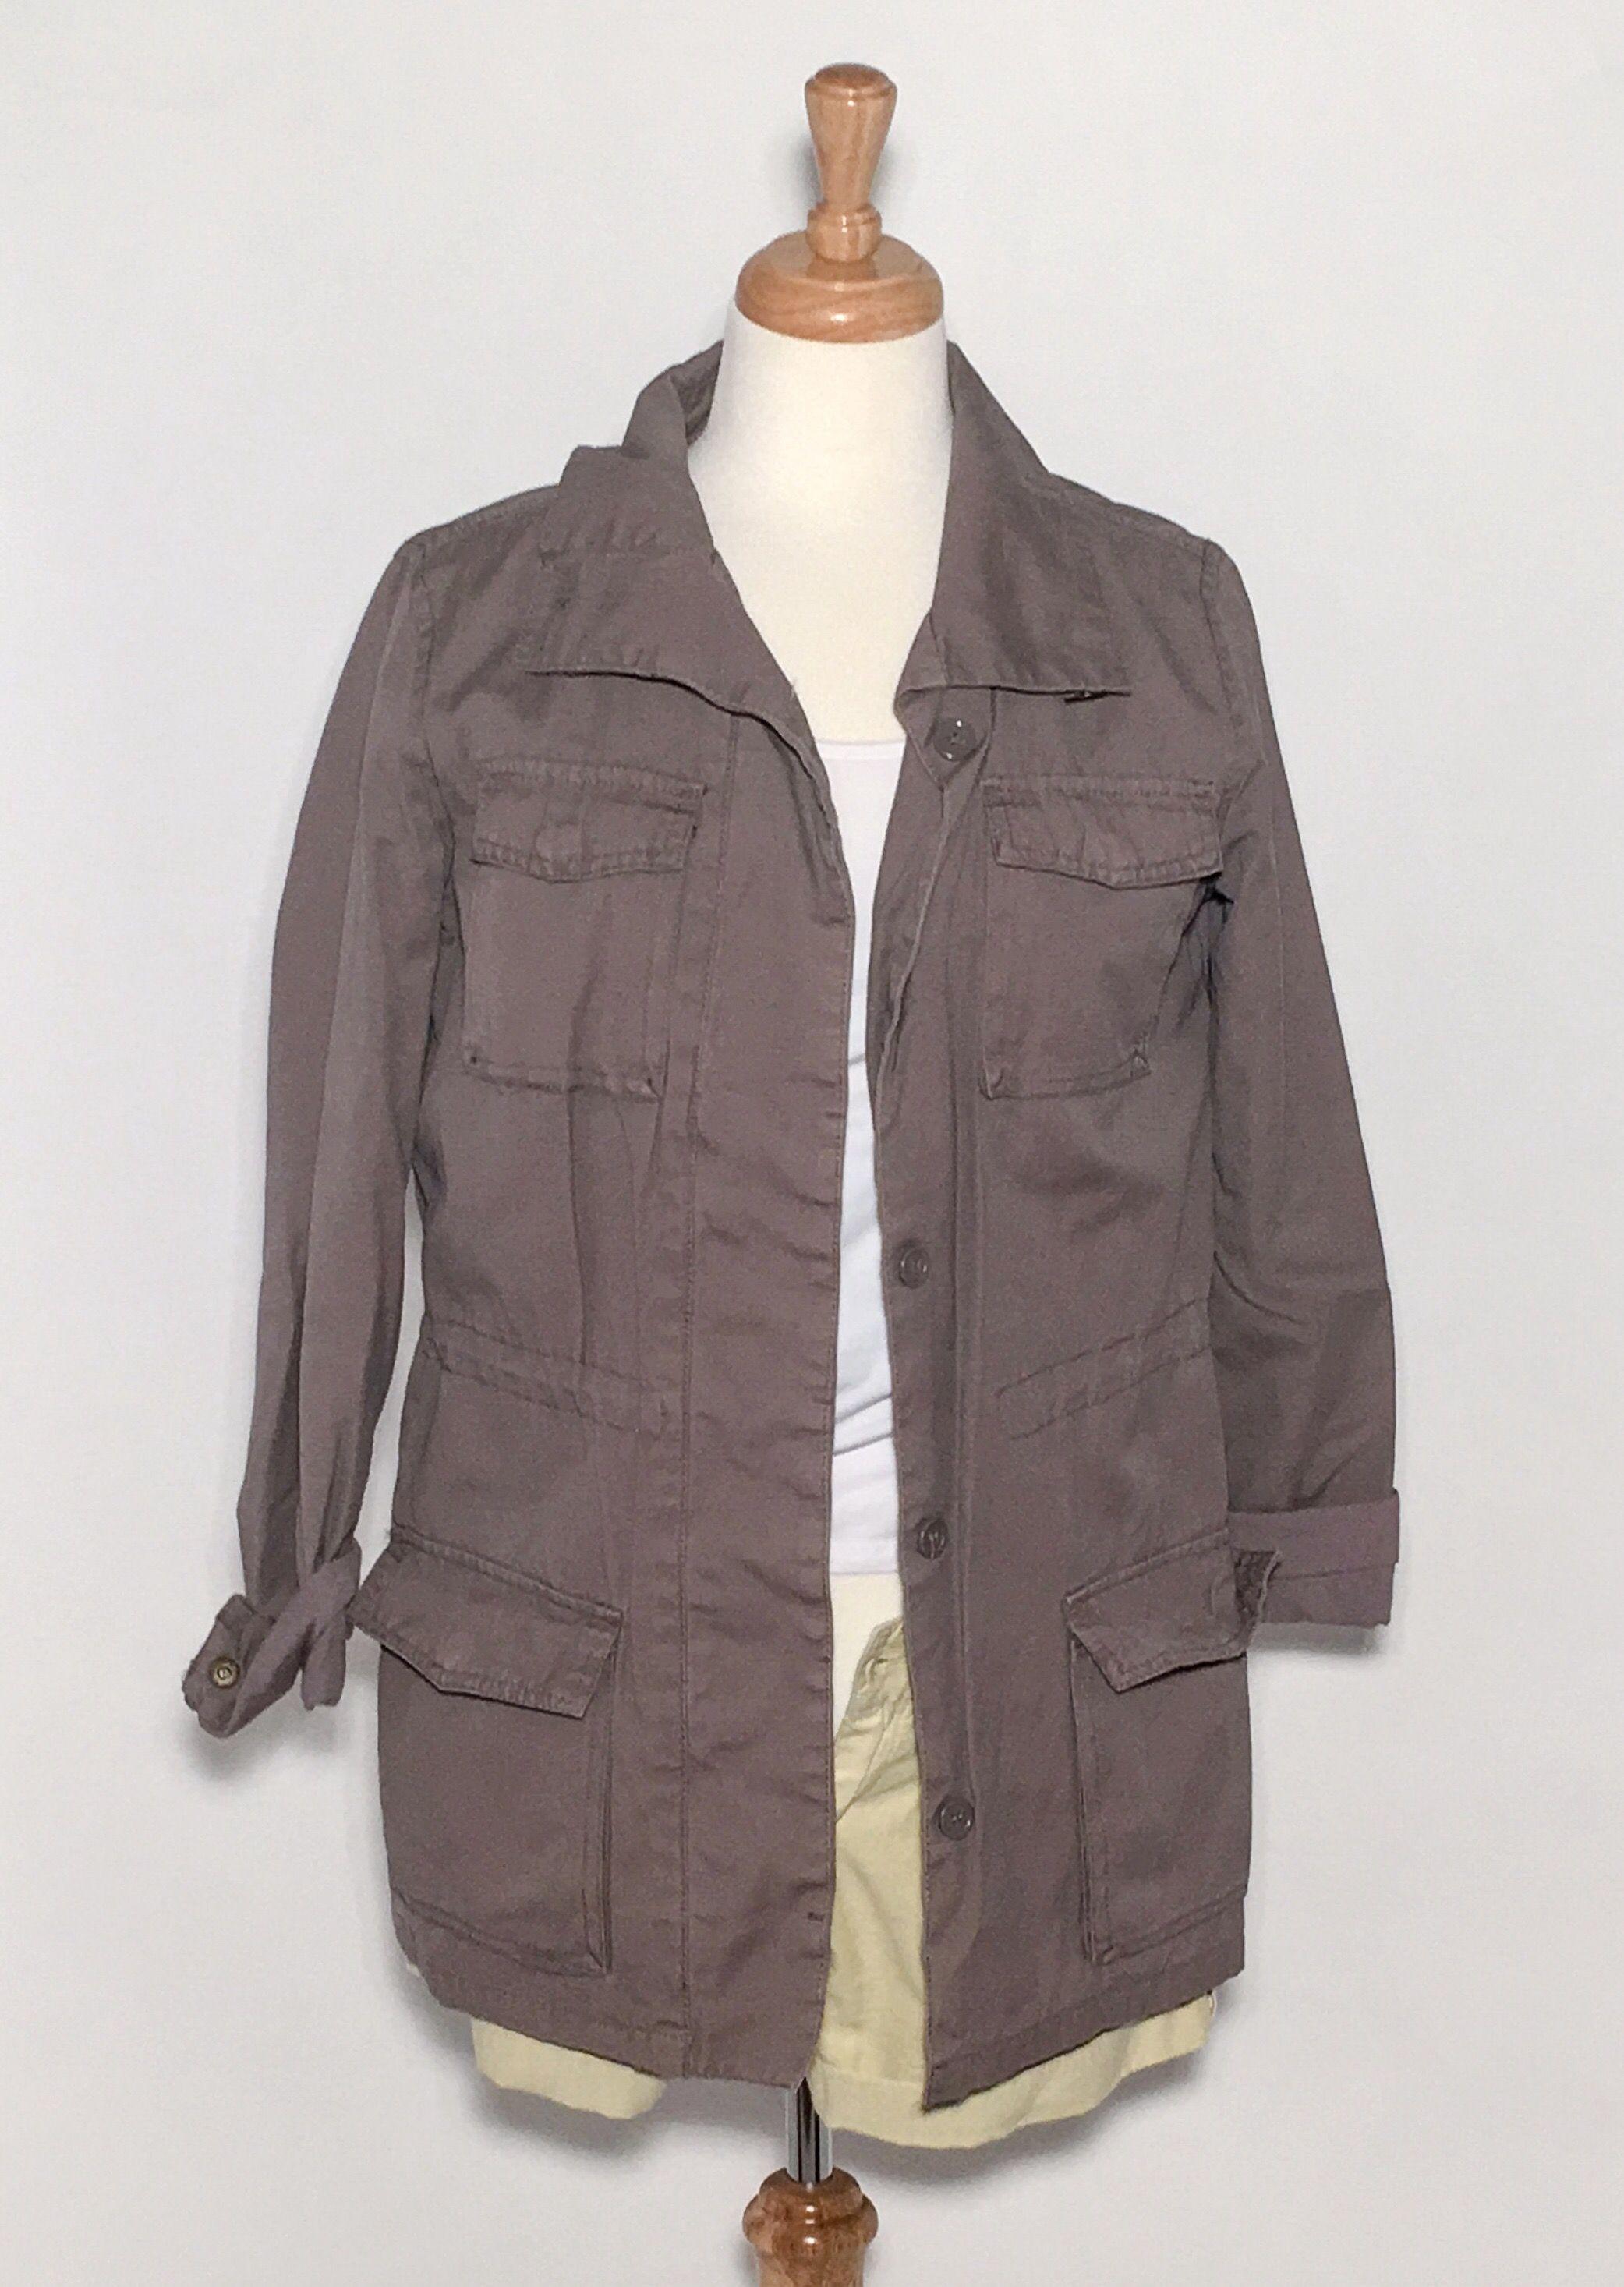 Saodimallsu Womens Casual Military Anorak Safari Utility Trench Jacket Windbreaker Parka Hoodie Coat